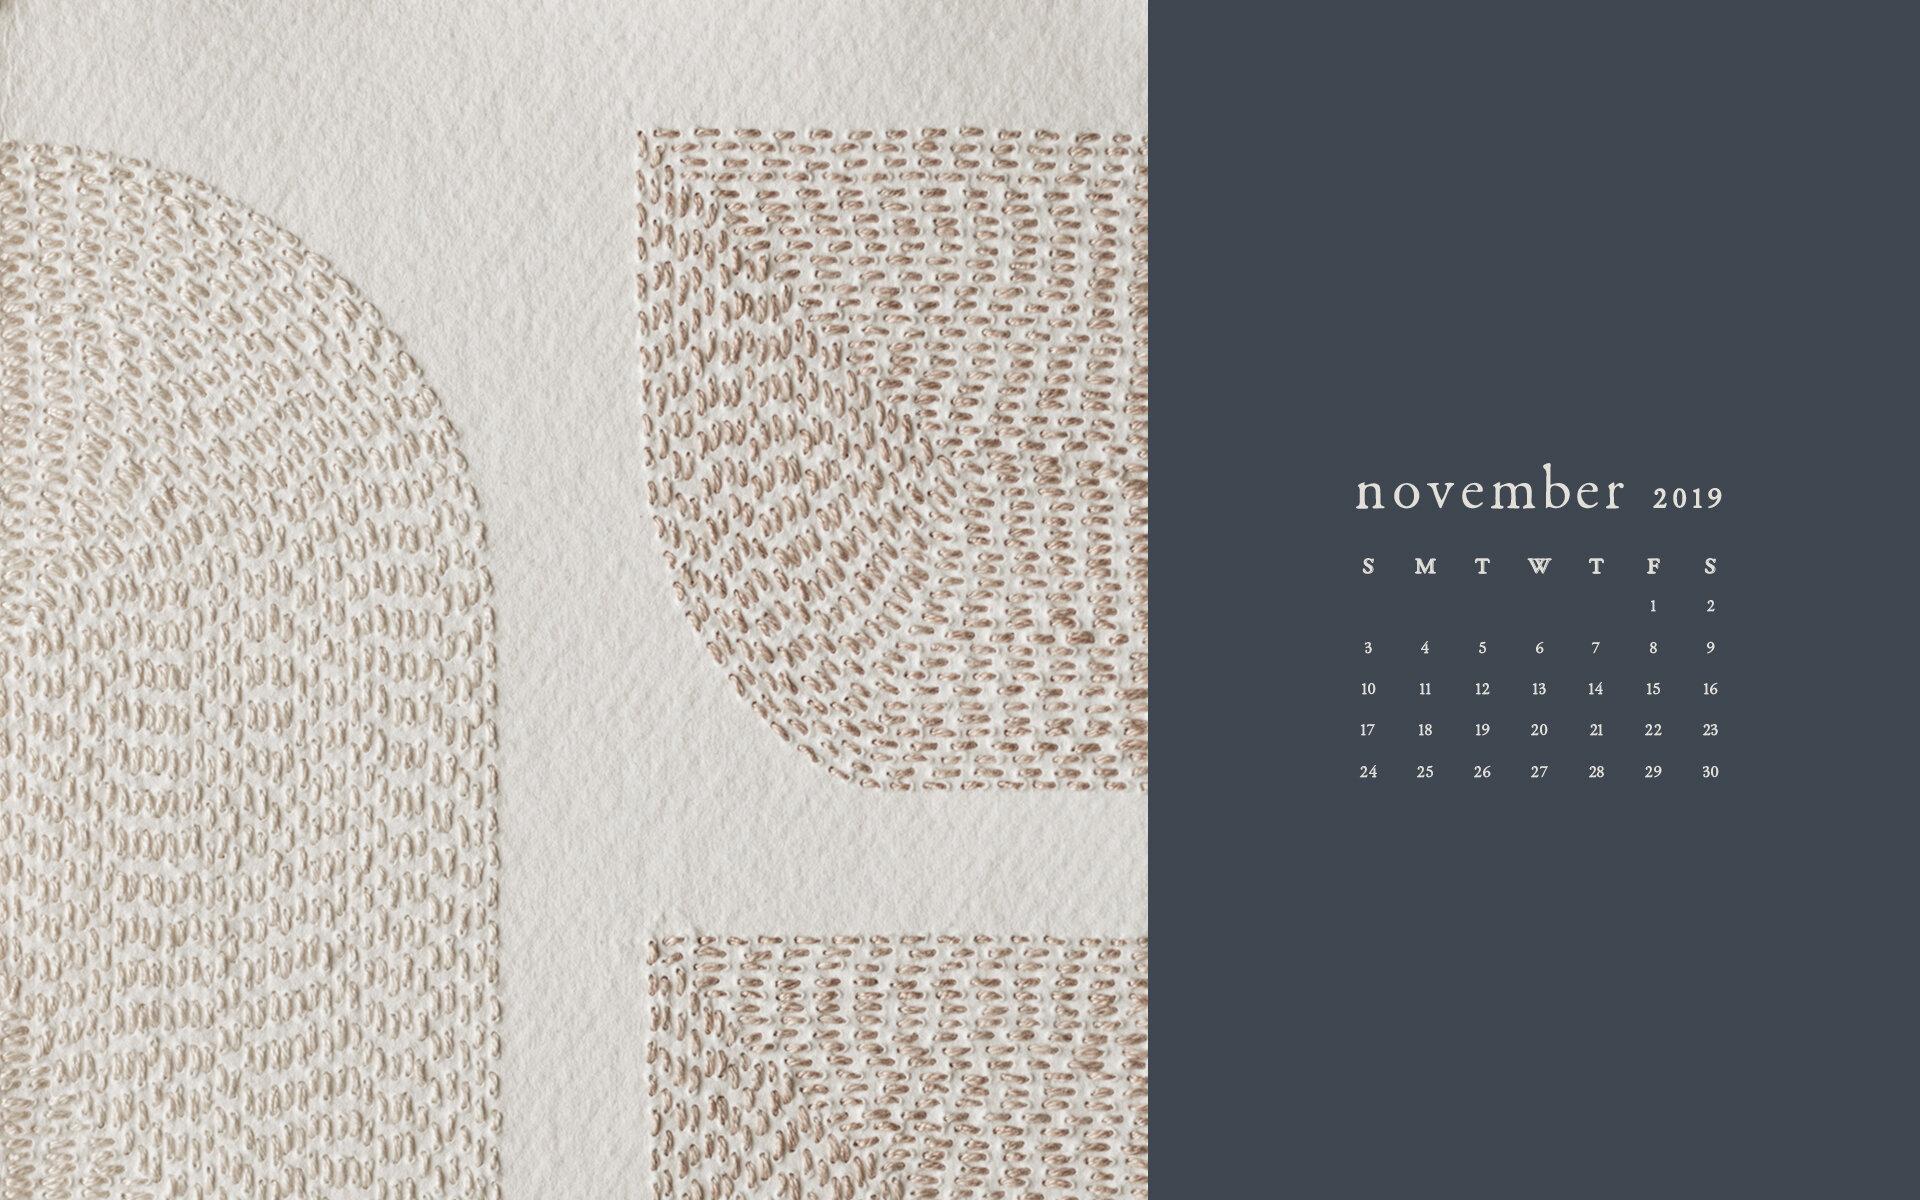 Wallpaper: November 2019 Calendar & Artwork | Computer | Britt Fabello